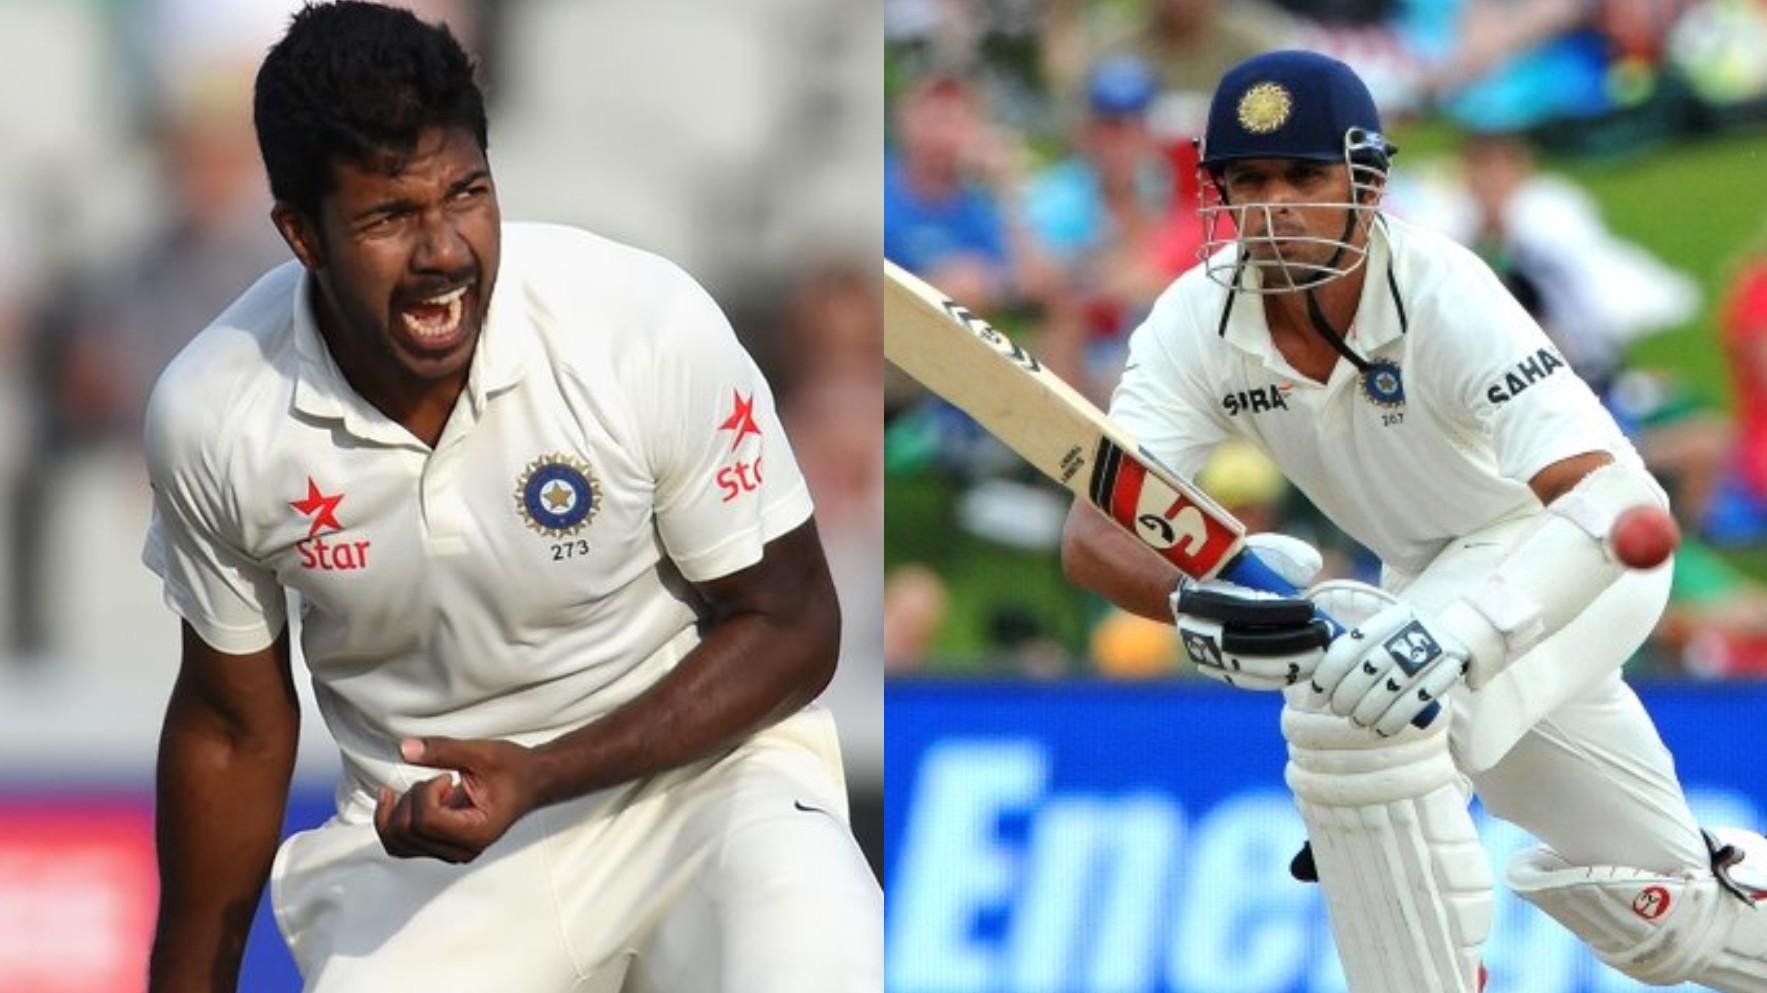 Varun Aaron calls Rahul Dravid the toughest batsman he has ever bowled to